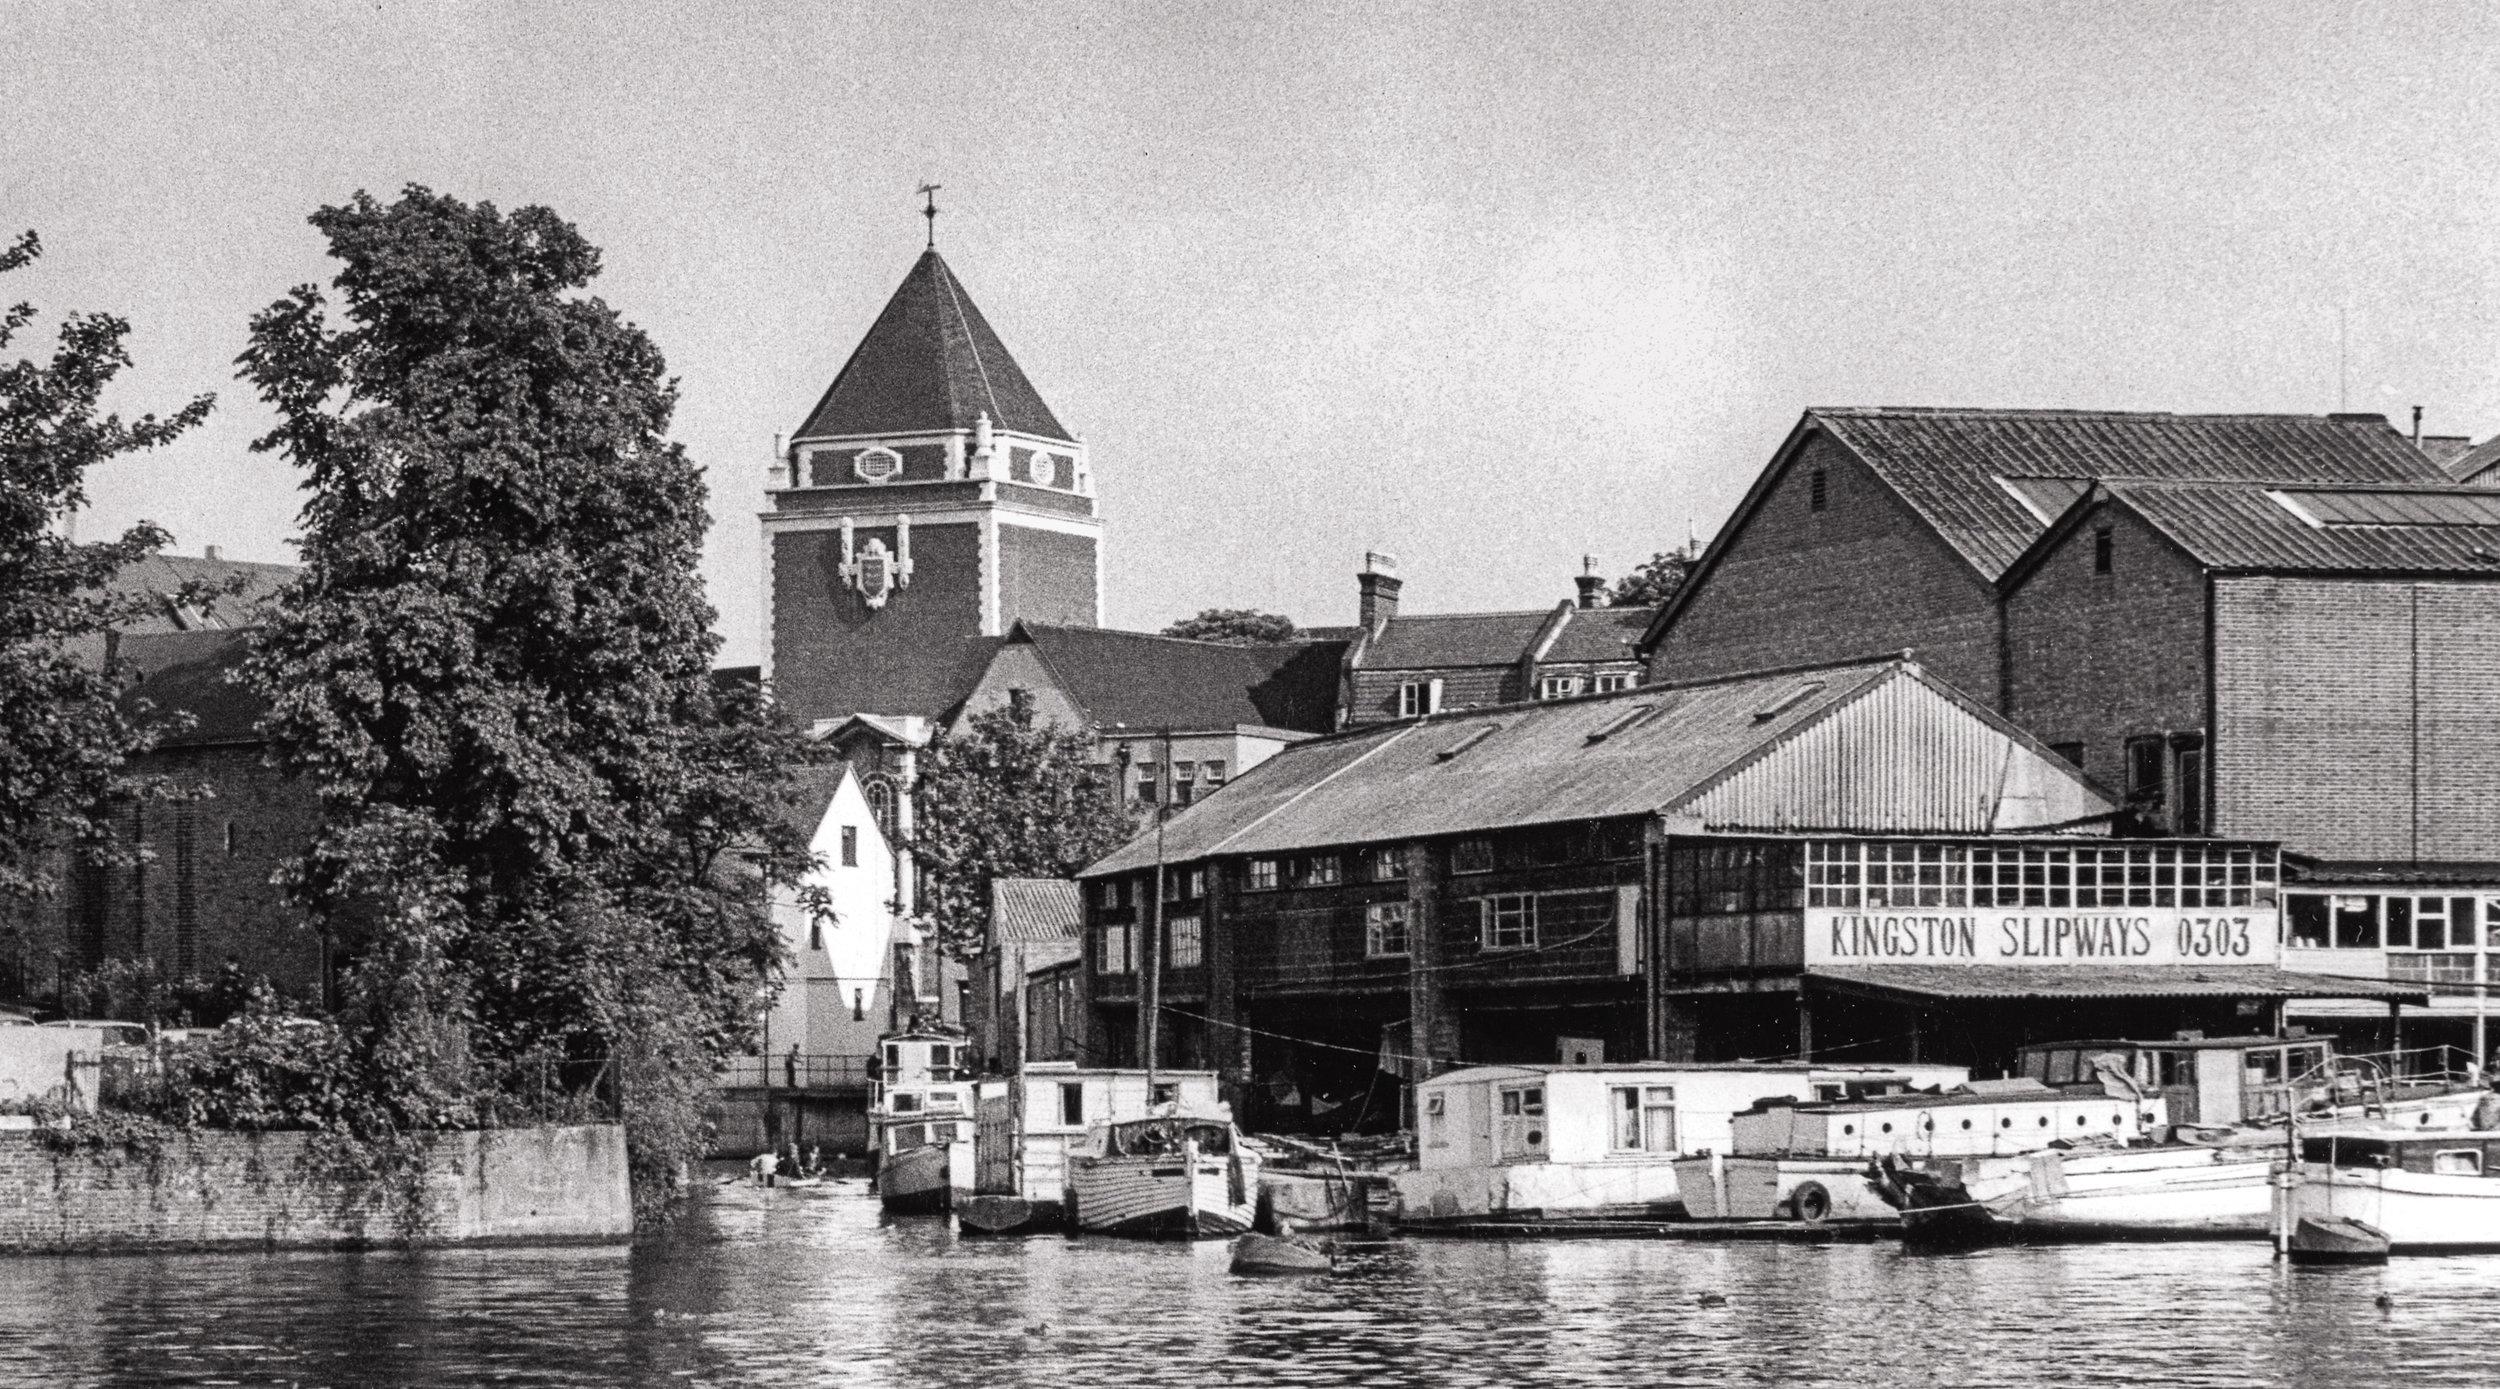 Charter Quay riverfront history.